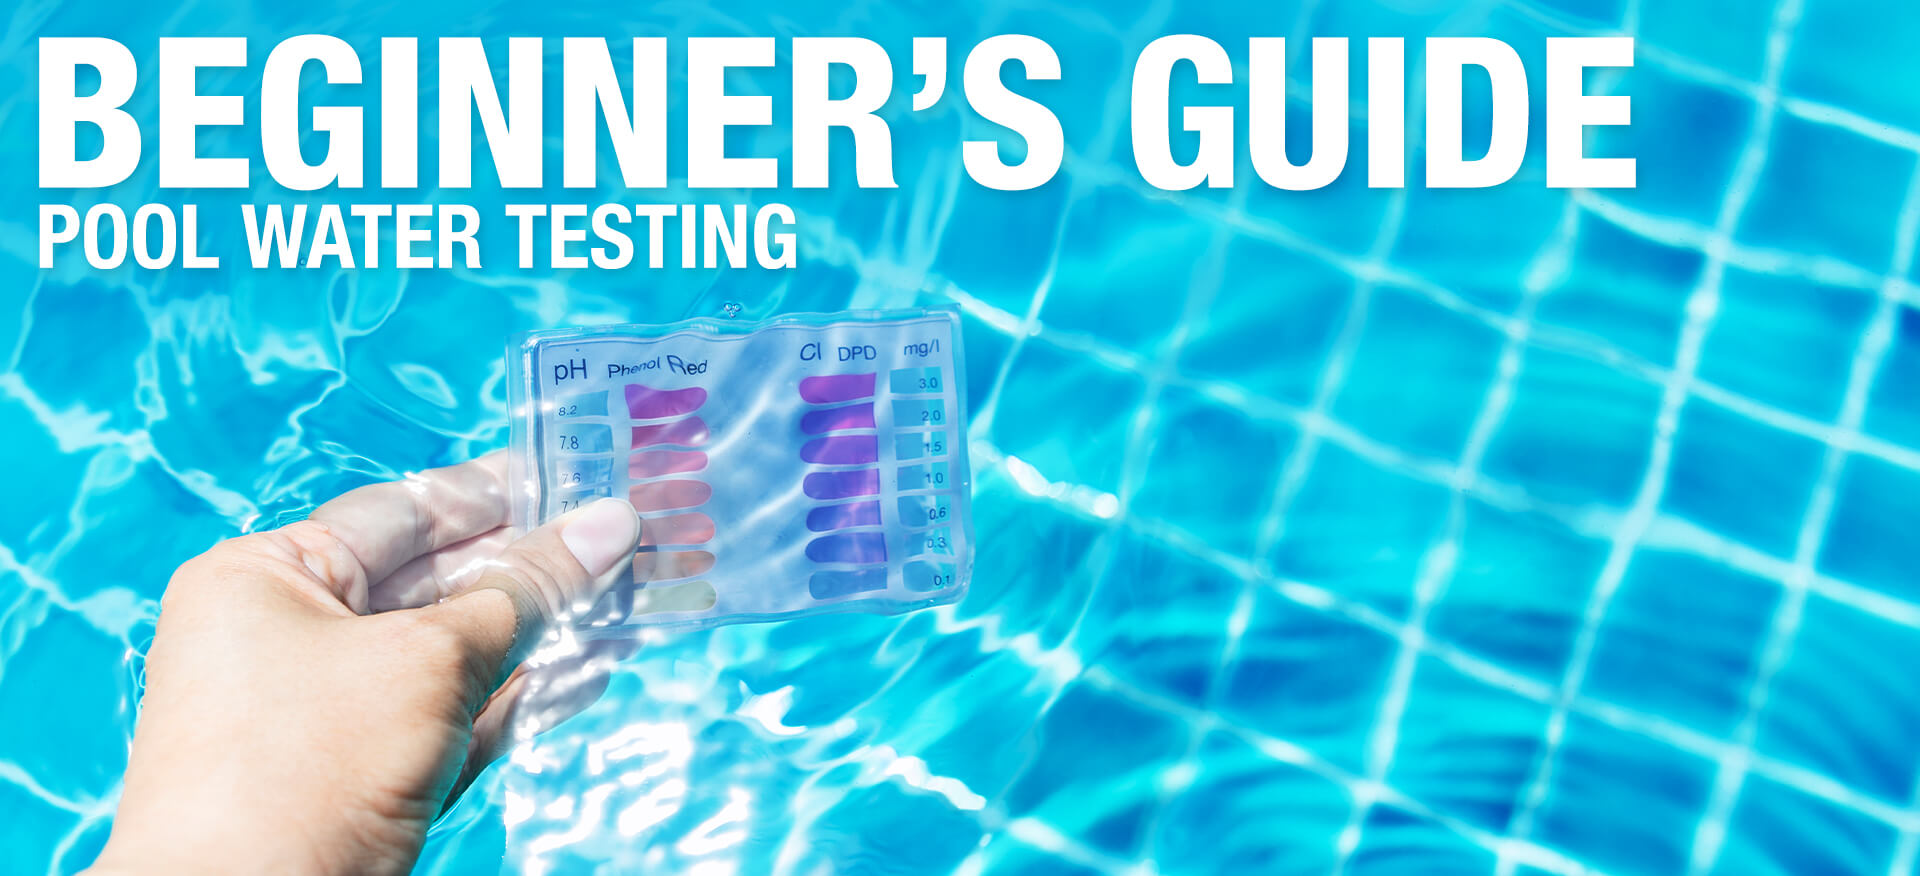 Beginner's Guide to Pool Water Testing